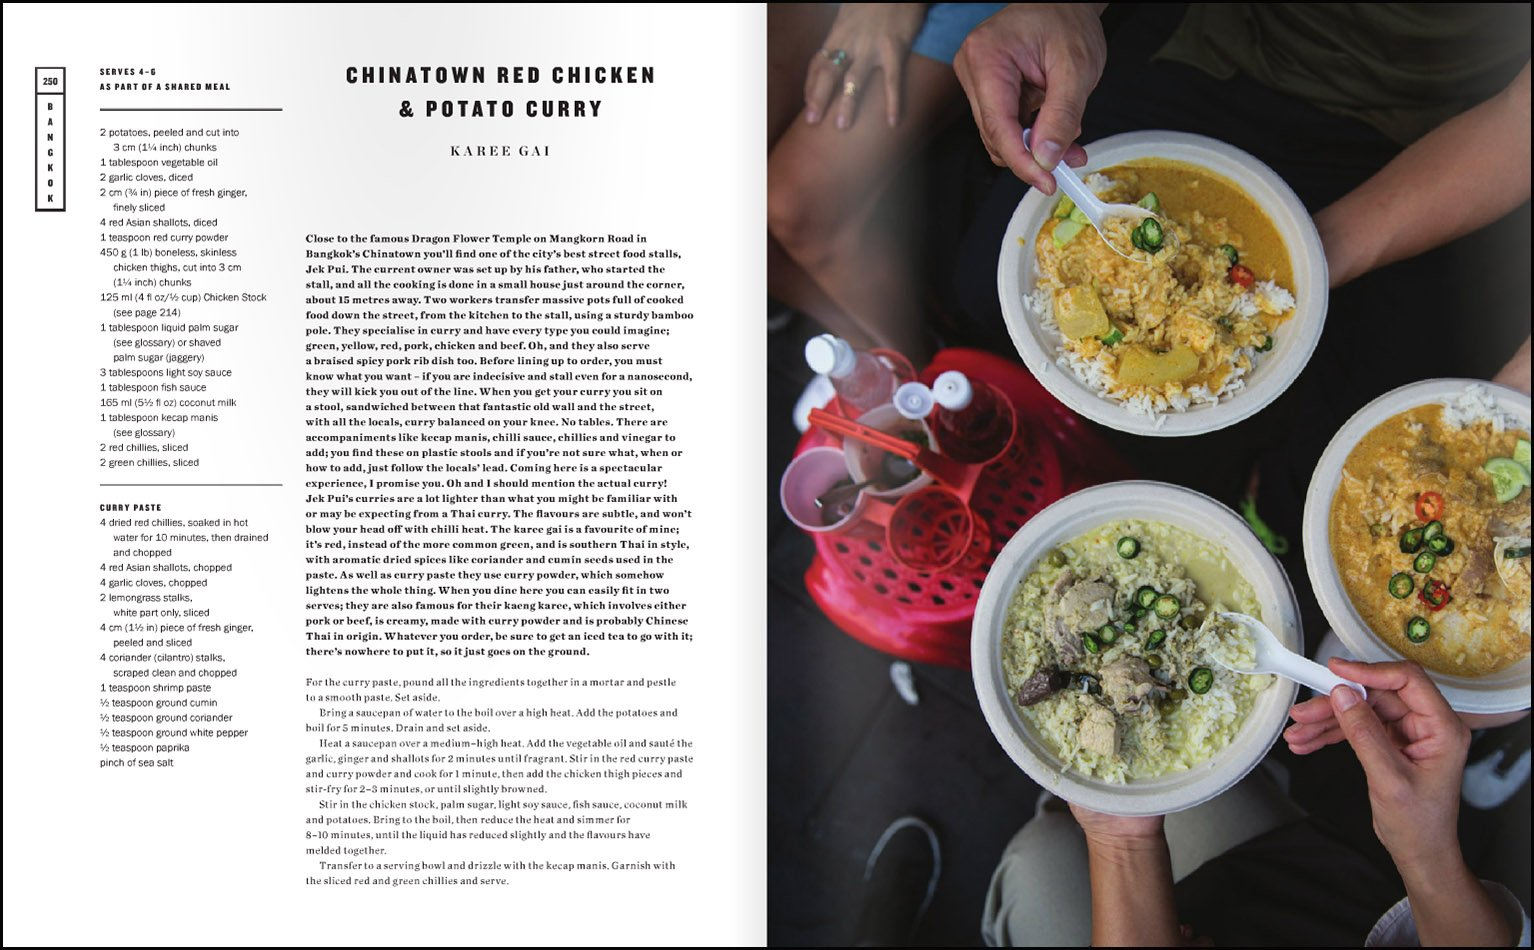 Luke nguyen street food asia amazon nguyen luke luke nguyen street food asia amazon nguyen luke 9781743792193 books forumfinder Choice Image